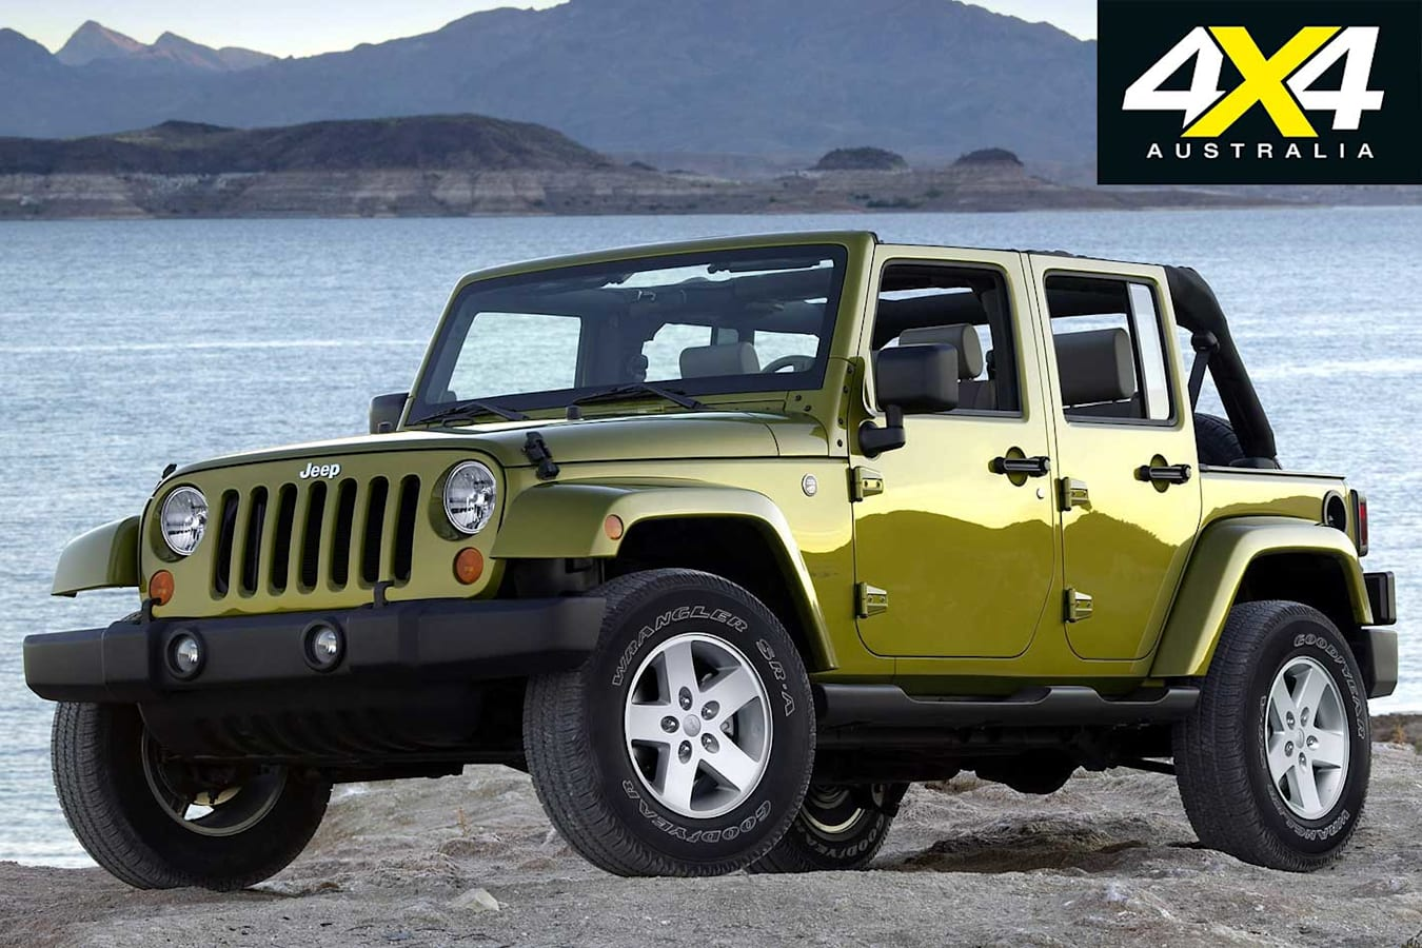 Jeep Wrangler Unlimited Jpg